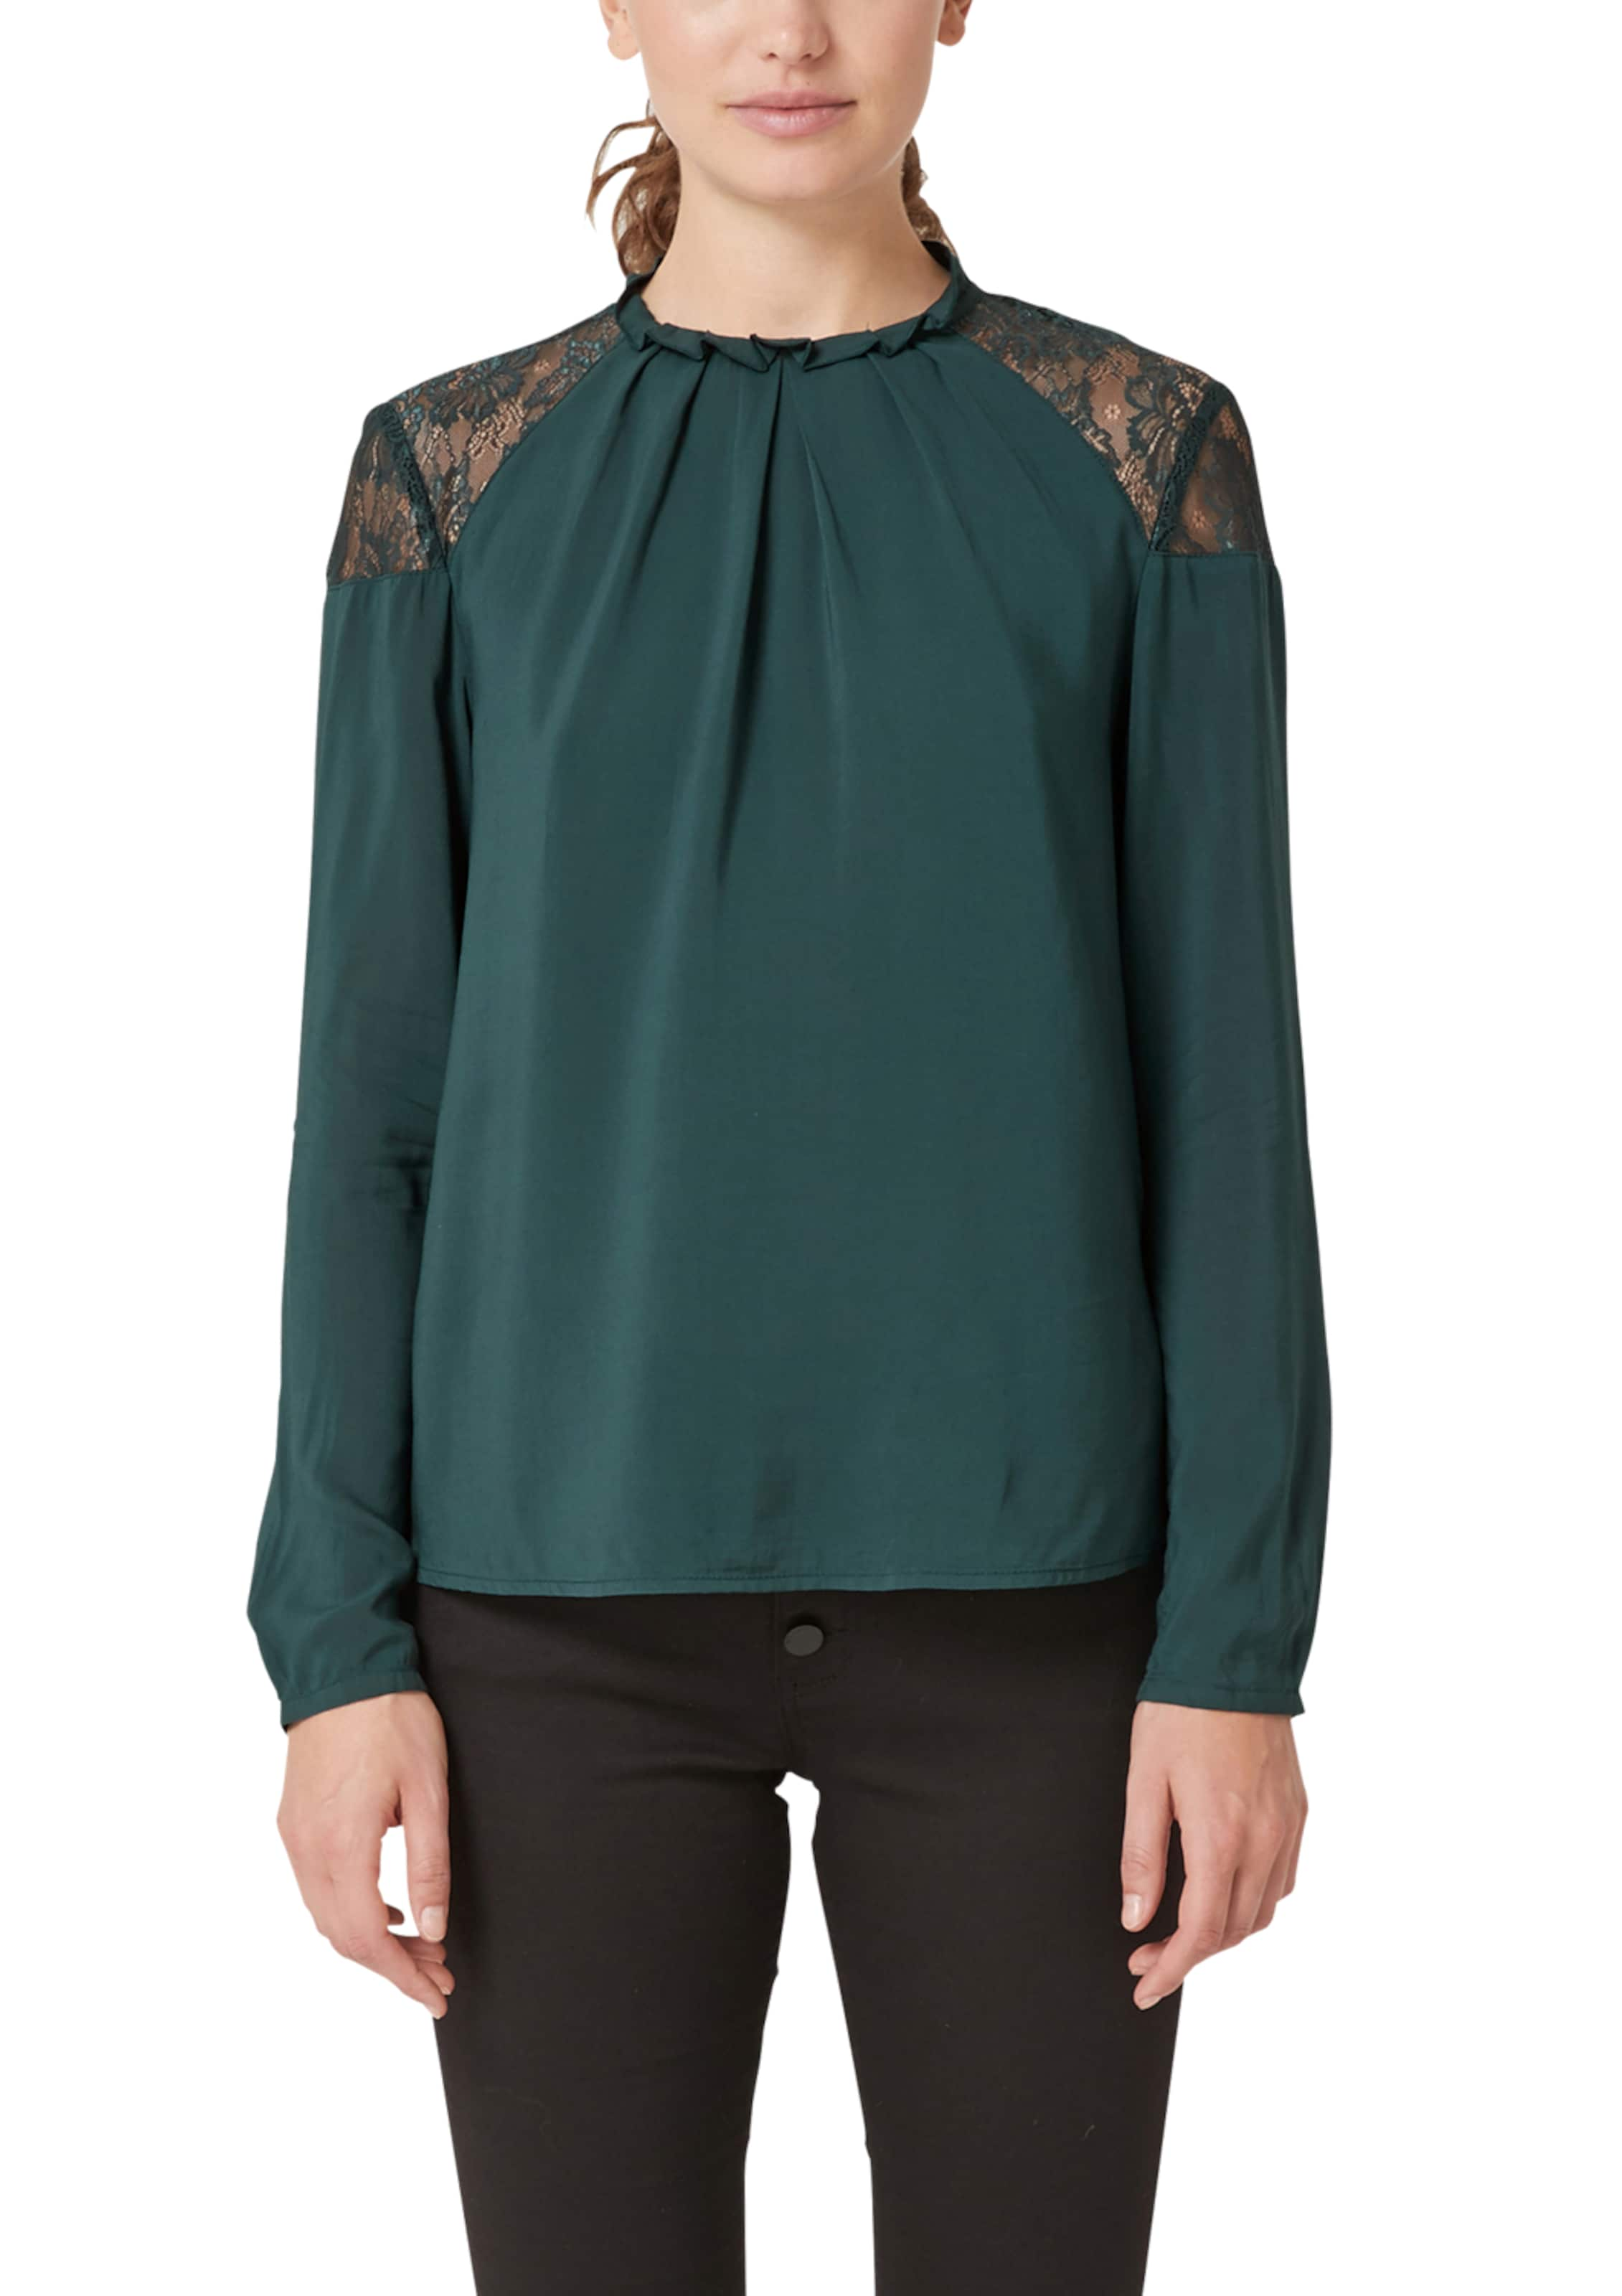 Bluse In Designed By Q Smaragd s c4L3SA5Rjq